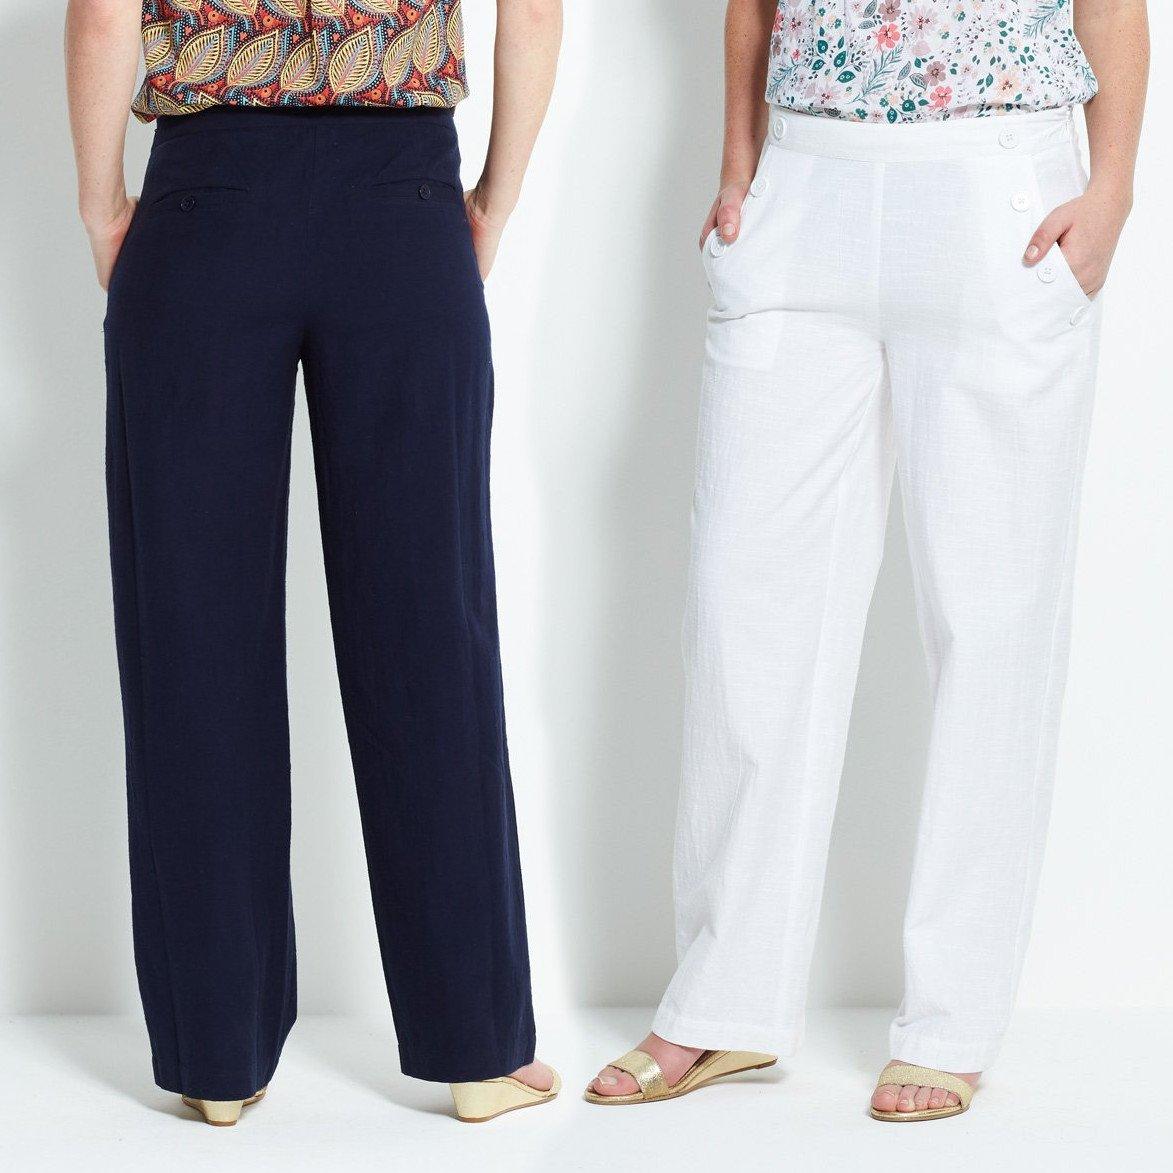 Pantaloni Marinaio in cotone equosolidale